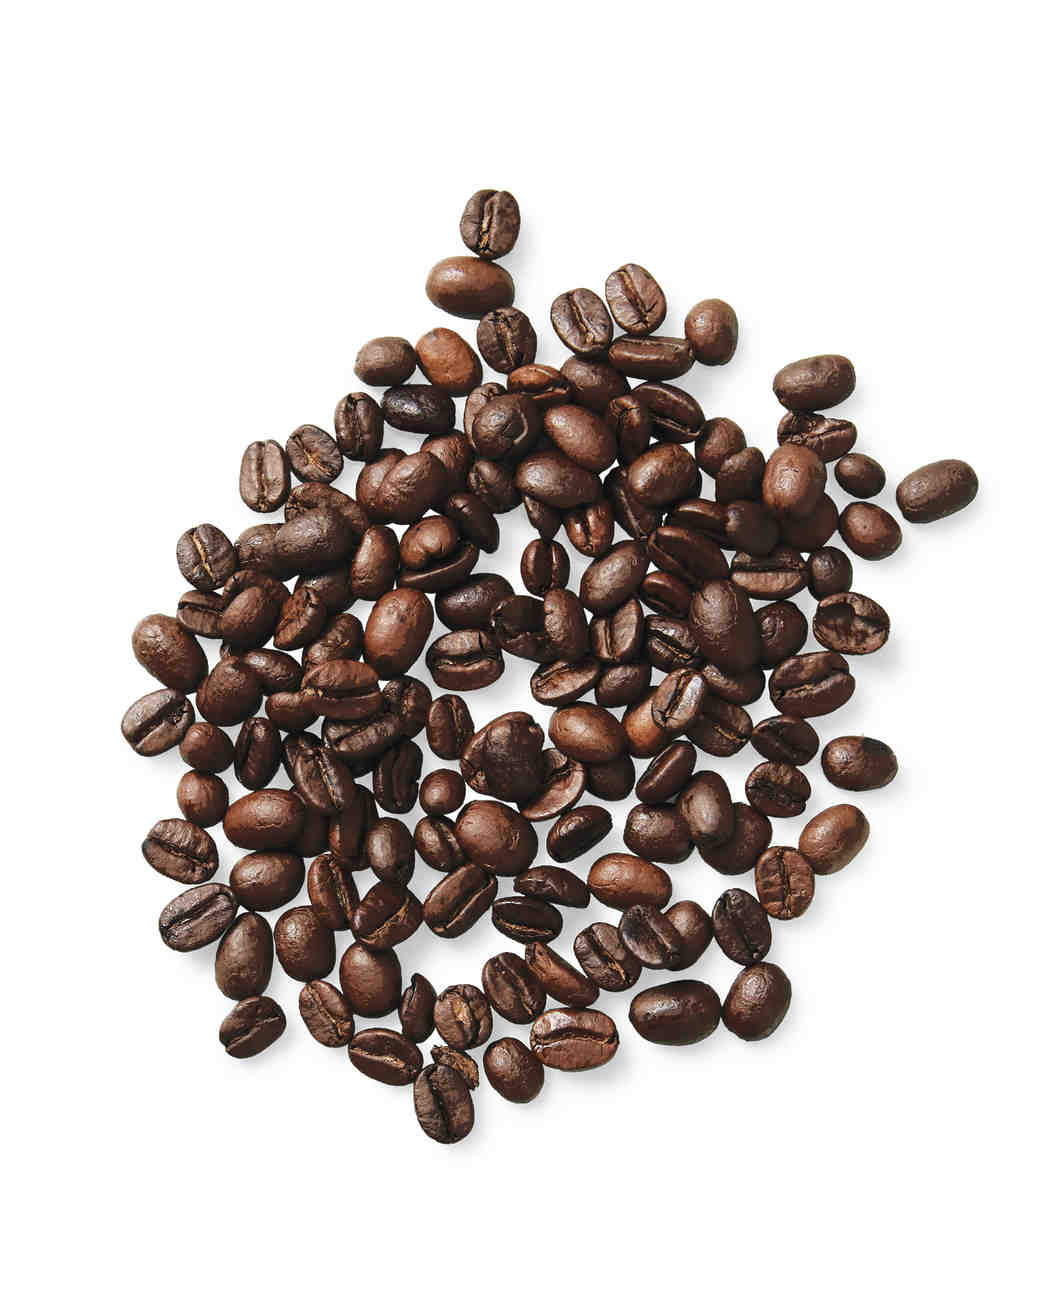 washington-wa-coffee-beans-298-d111965.jpg